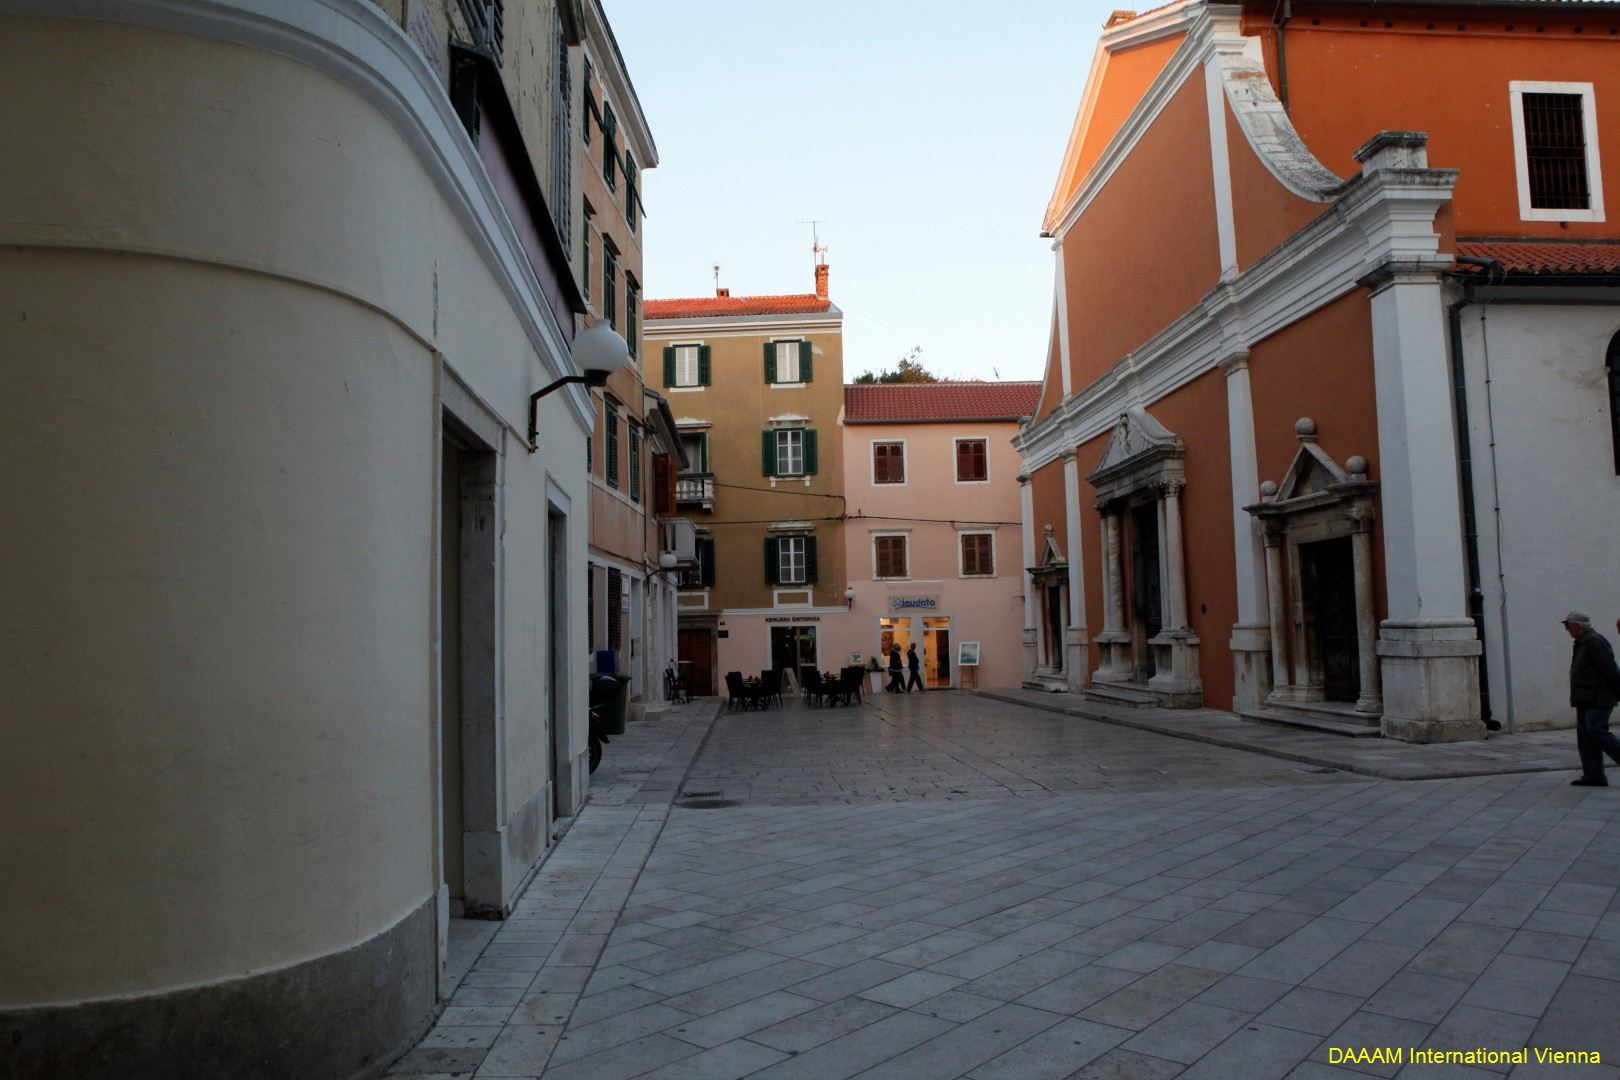 DAAAM_2012_Zadar_00_Zadar_City_009